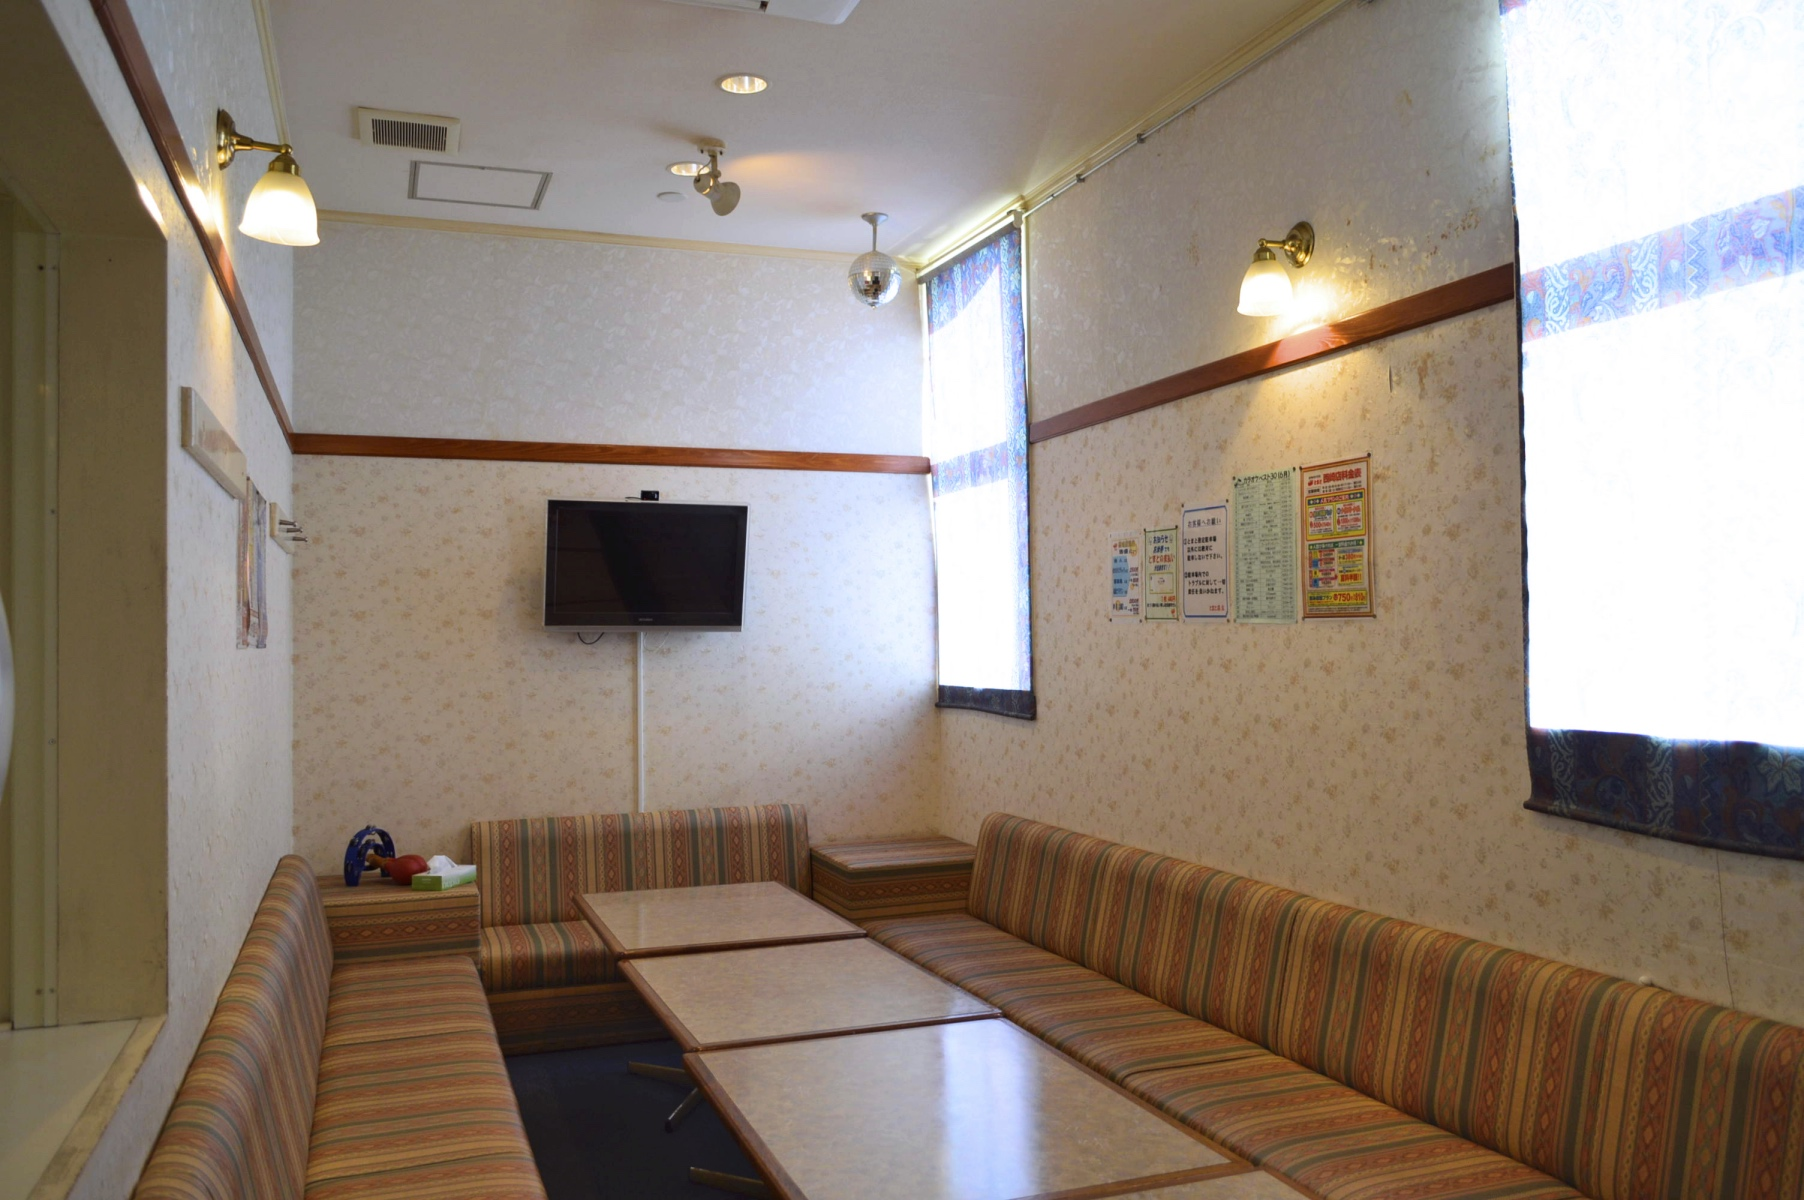 http://ktomato.wp.xdomain.jp/wp-content/uploads/2016/07/nishizaki02.jpg